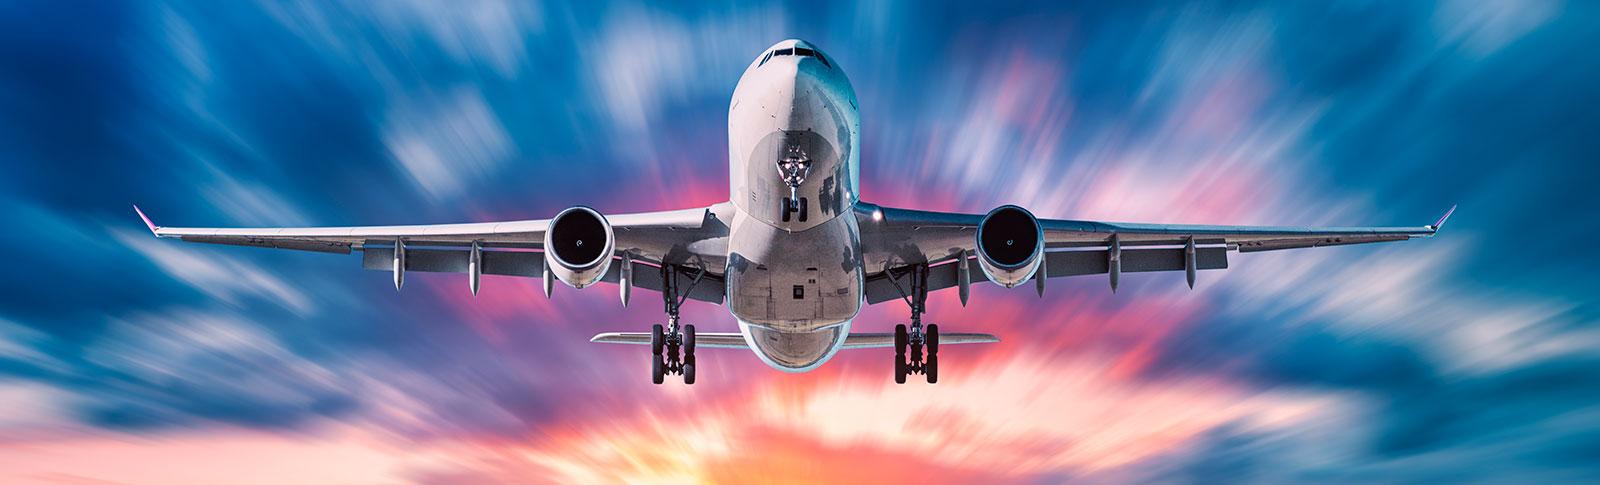 Flight School Courses: Commercial Pilot Certificate